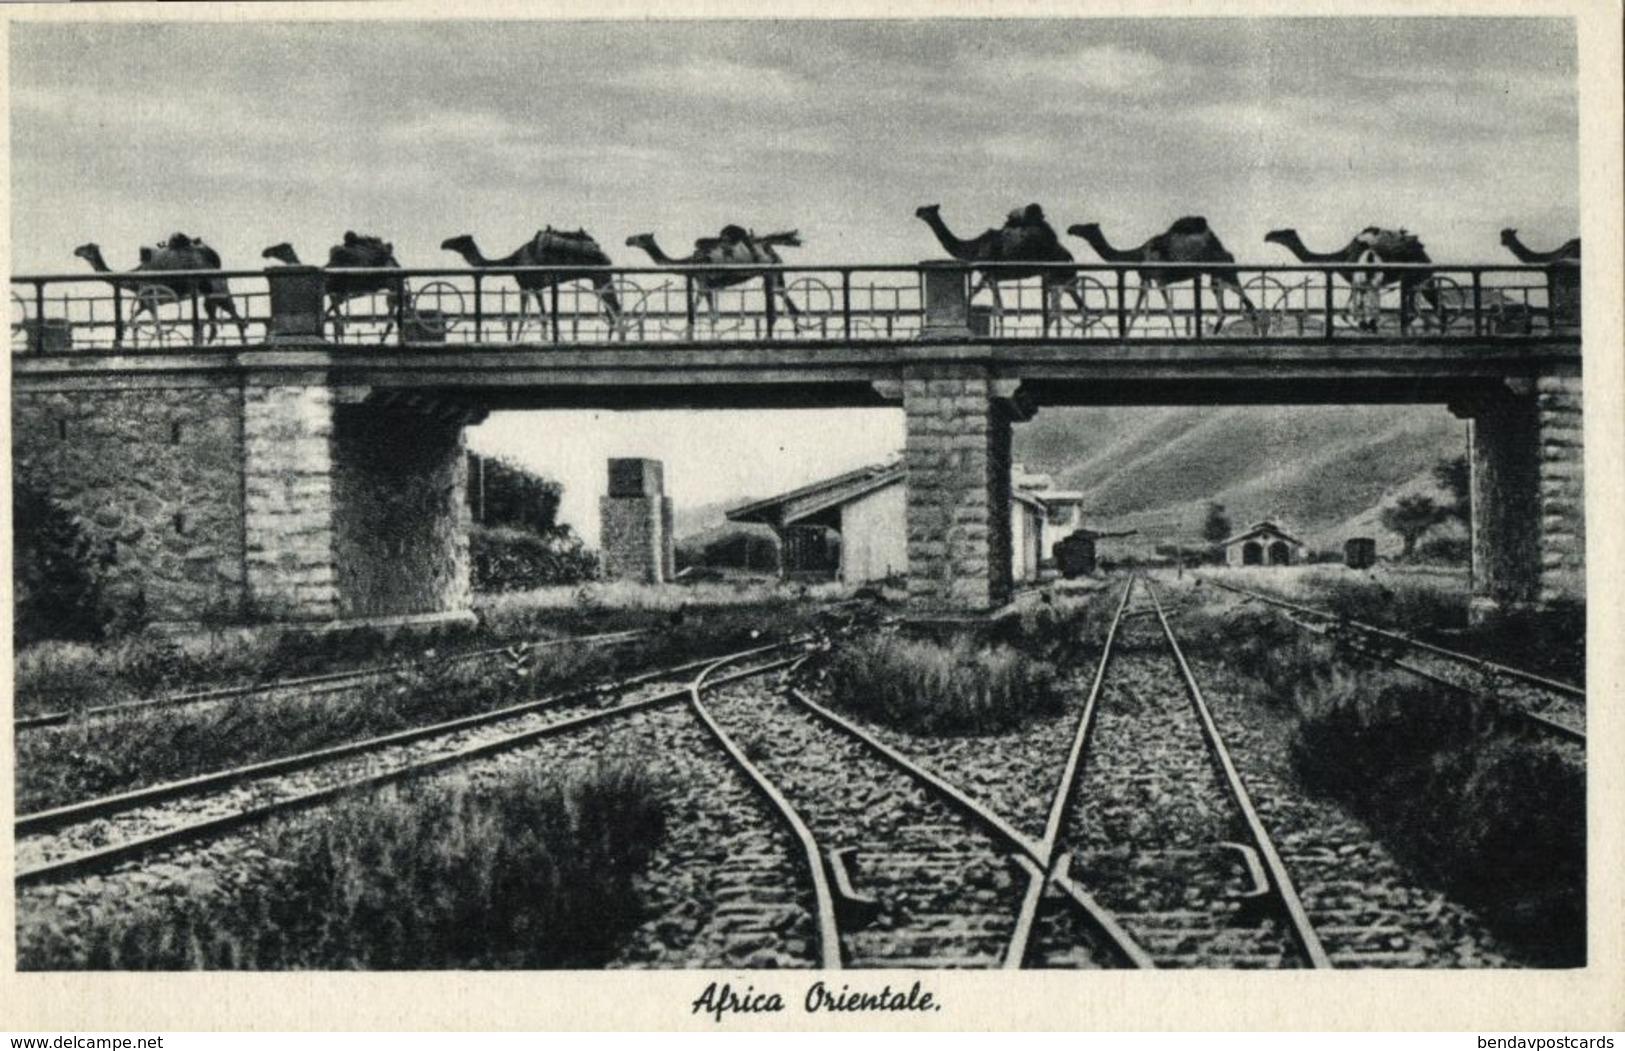 Italian East Africa, Bridge Over Railway Track, Station, Camels (1930s) Postcard - Cartoline